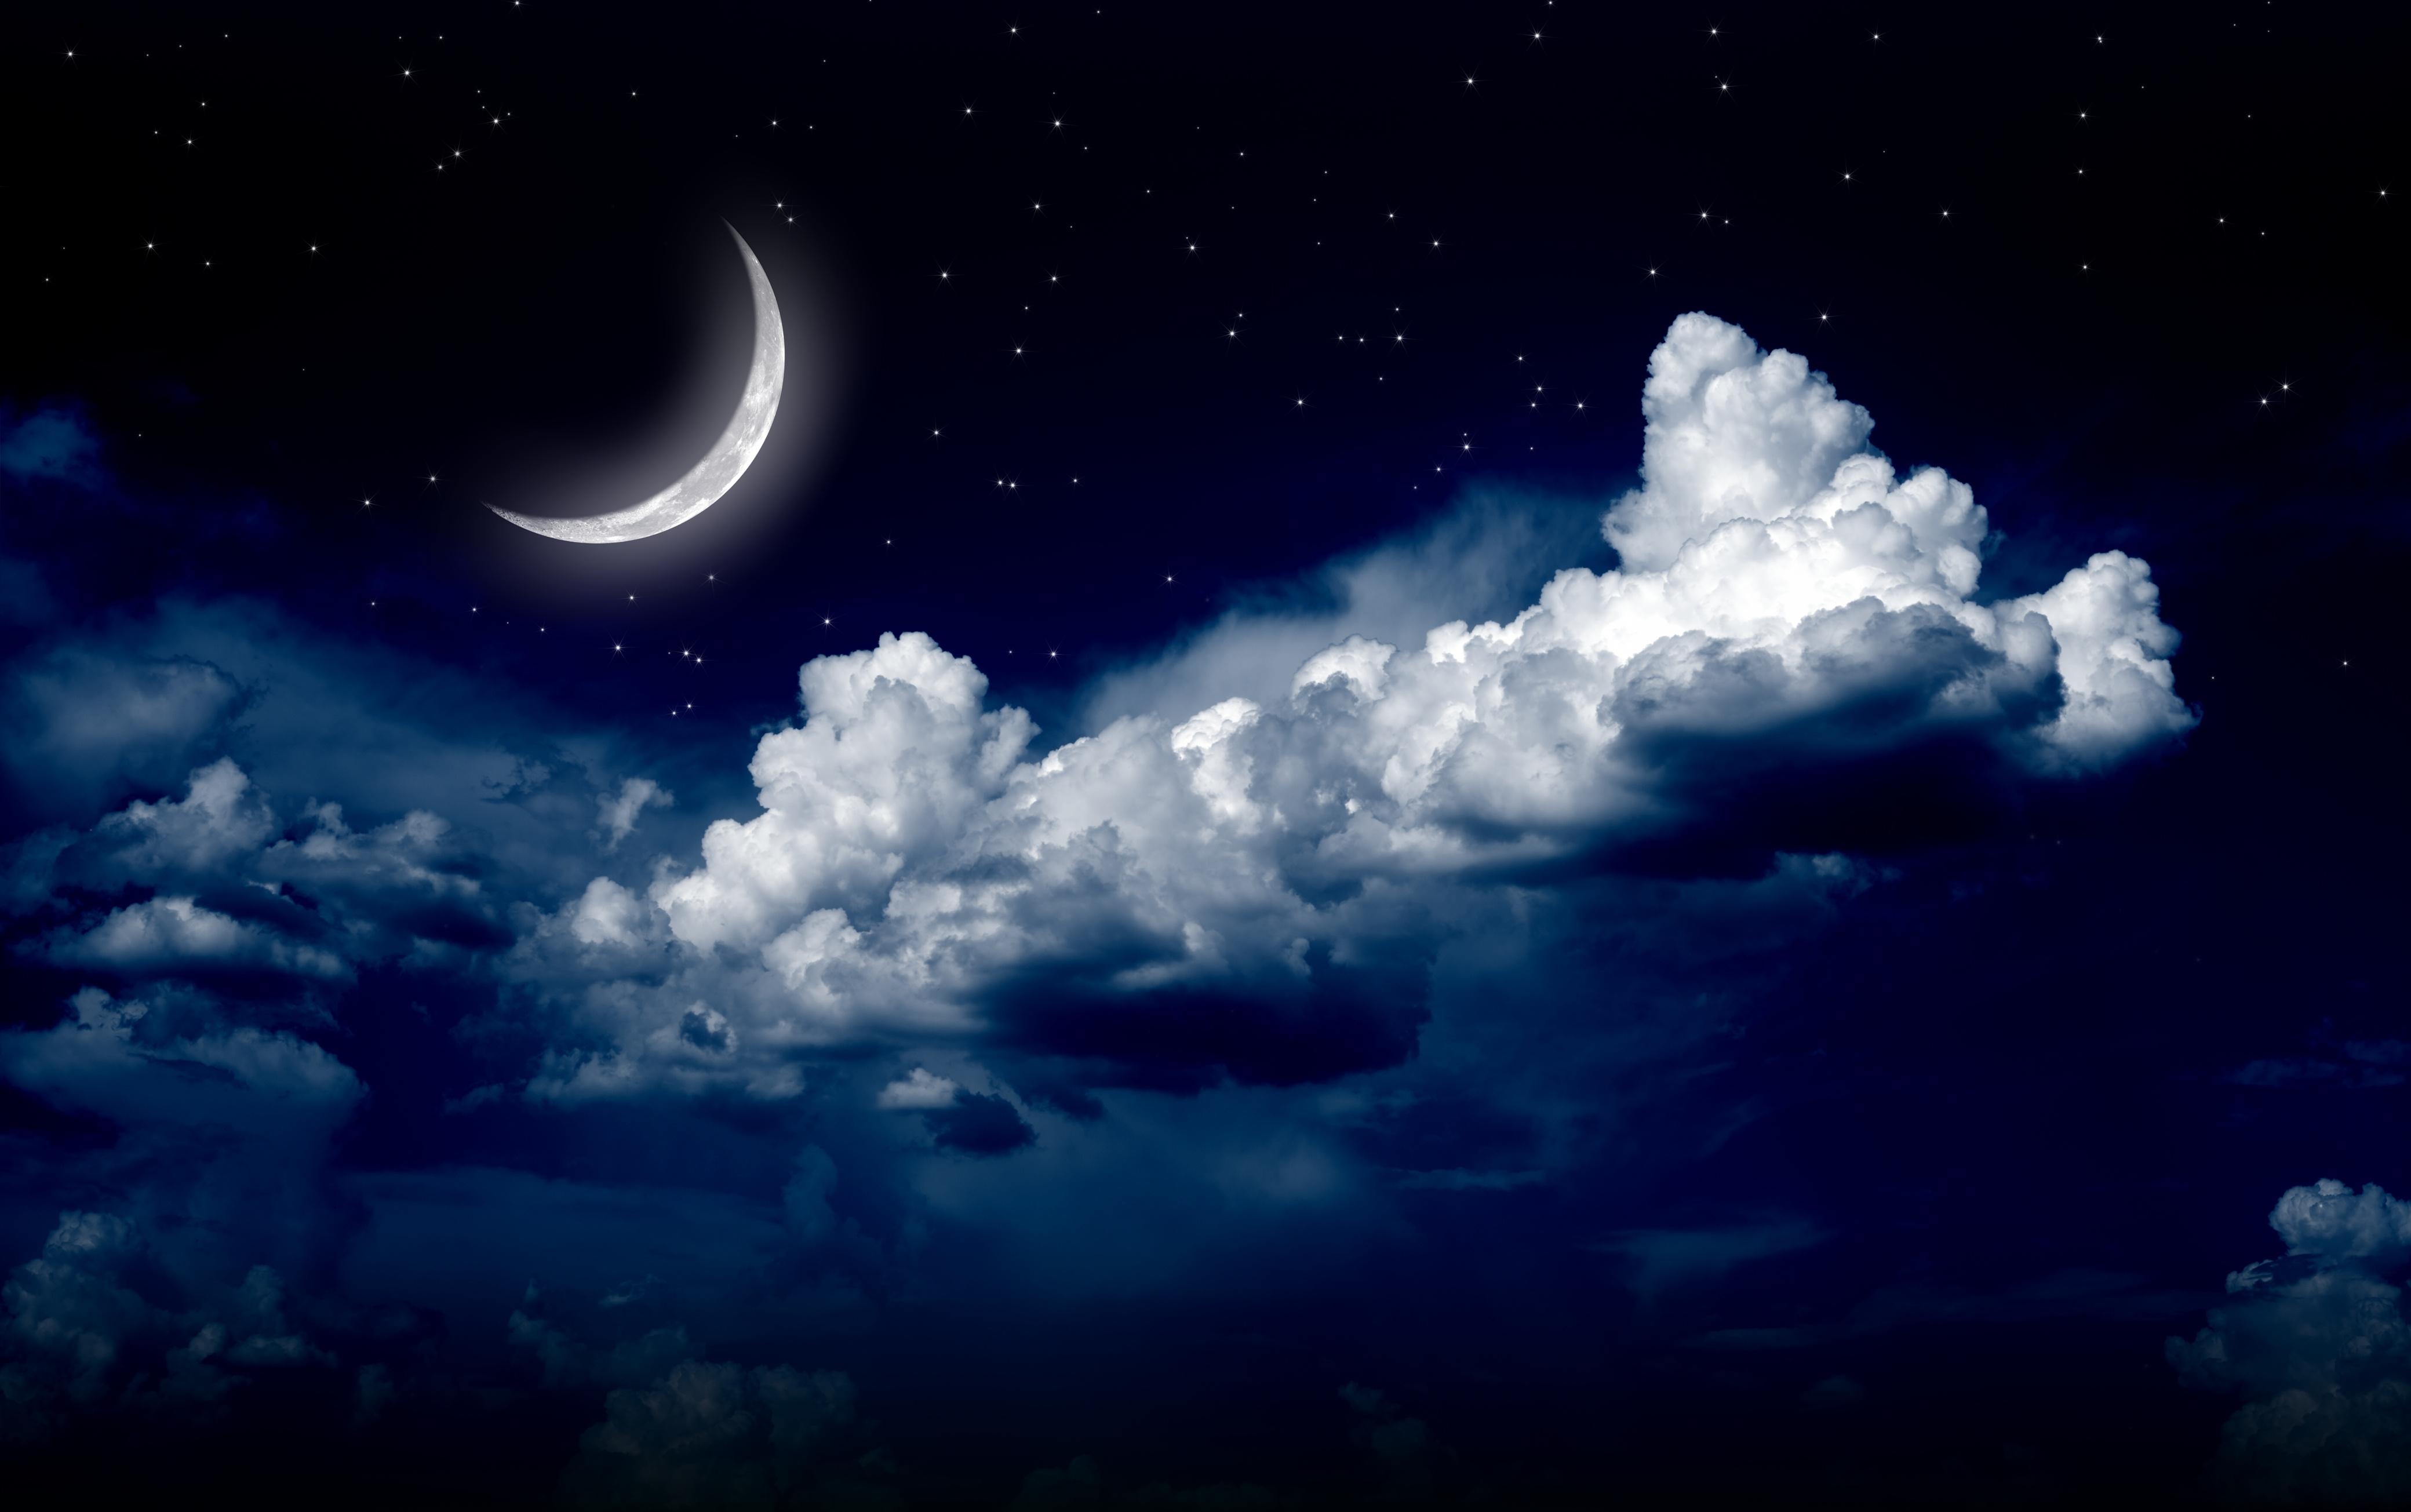 moon and stars - HD4160×2609